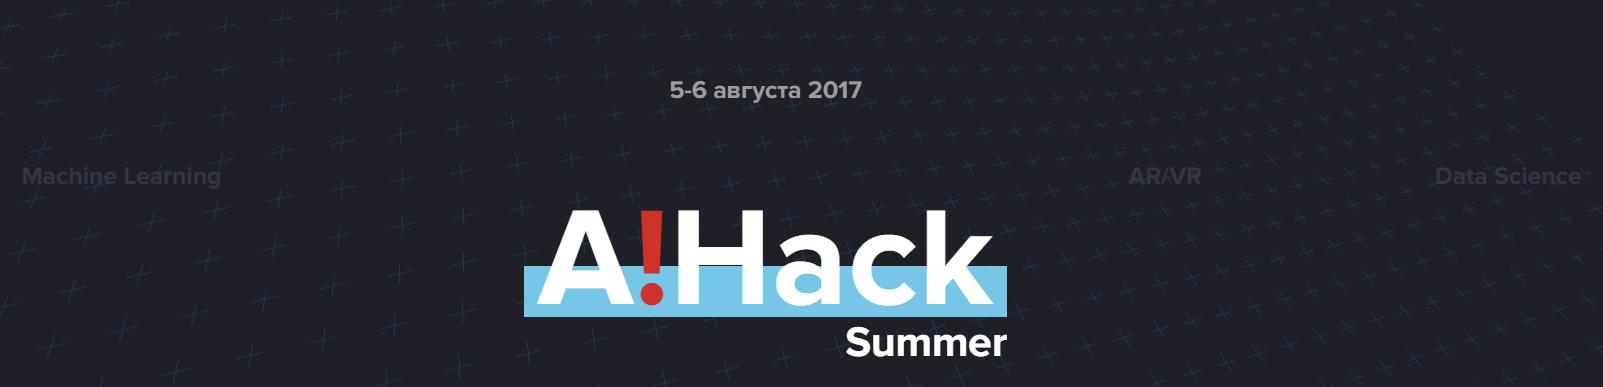 A!Hack Summer — хакатон Альфа-Банка 5 и 6 августа 2017